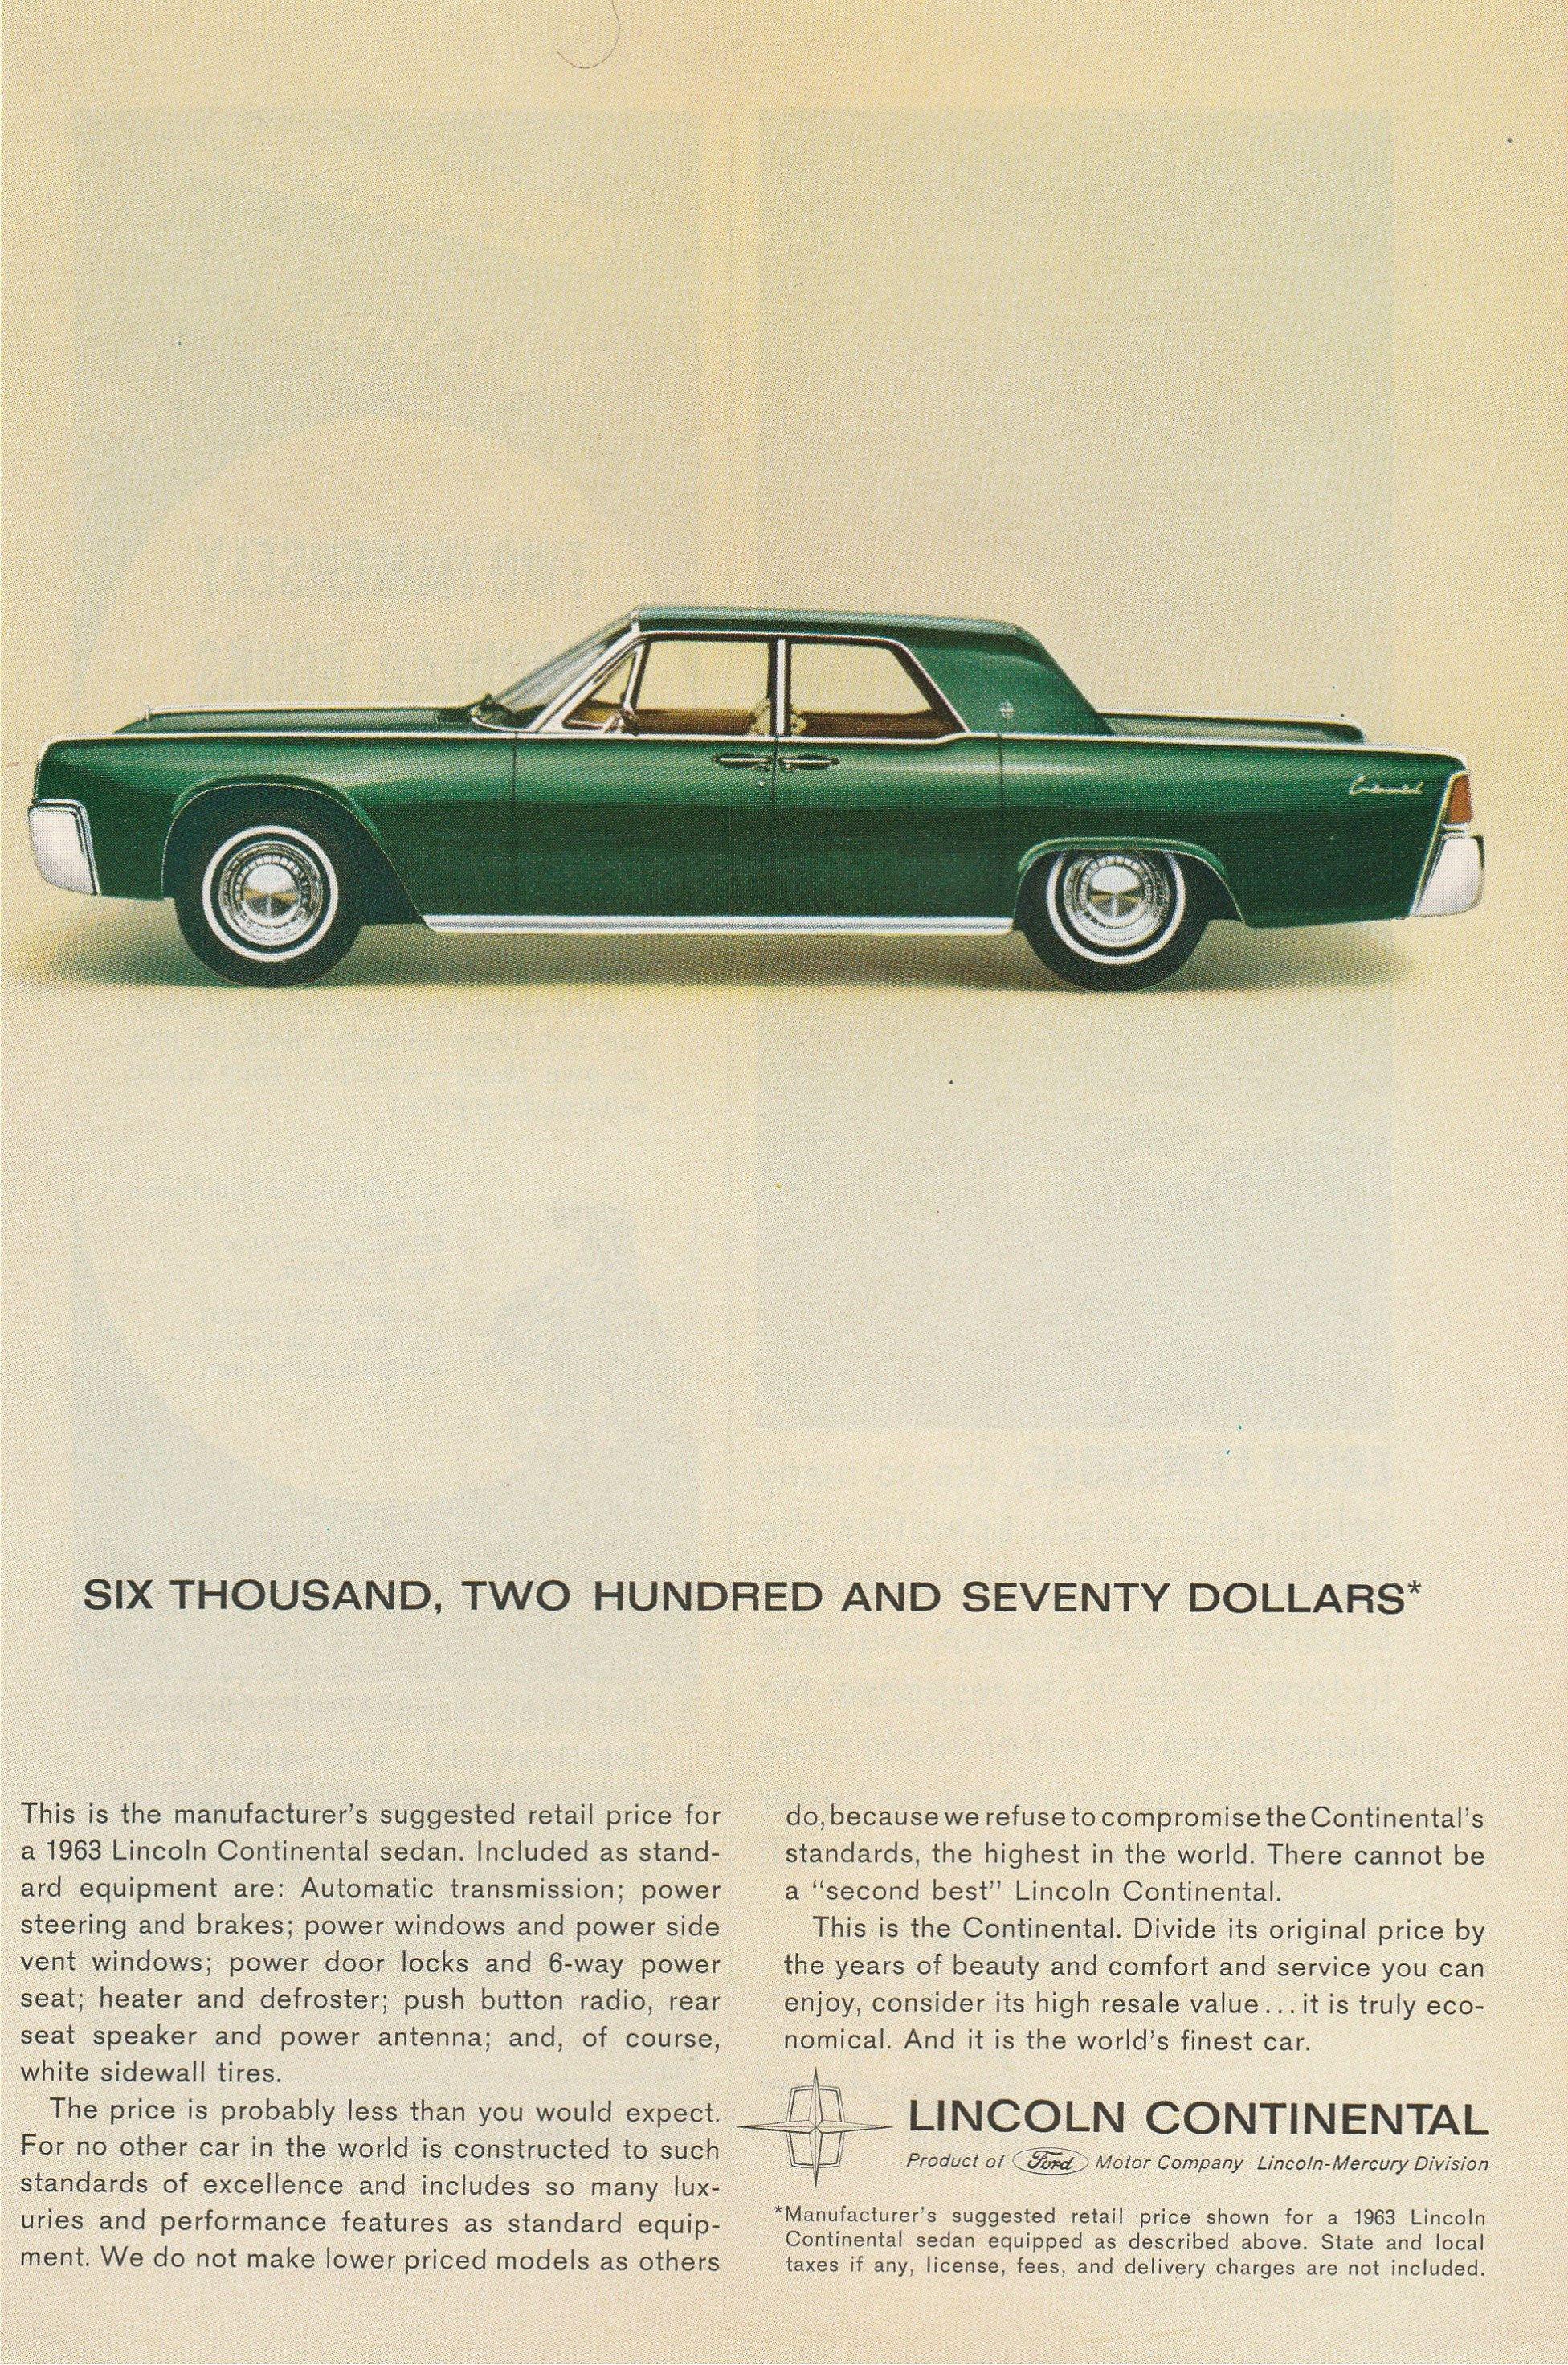 1966 LINCOLN CONTINENTAL Hardtop /& Convertible Car Vintage Look METAL SIGN